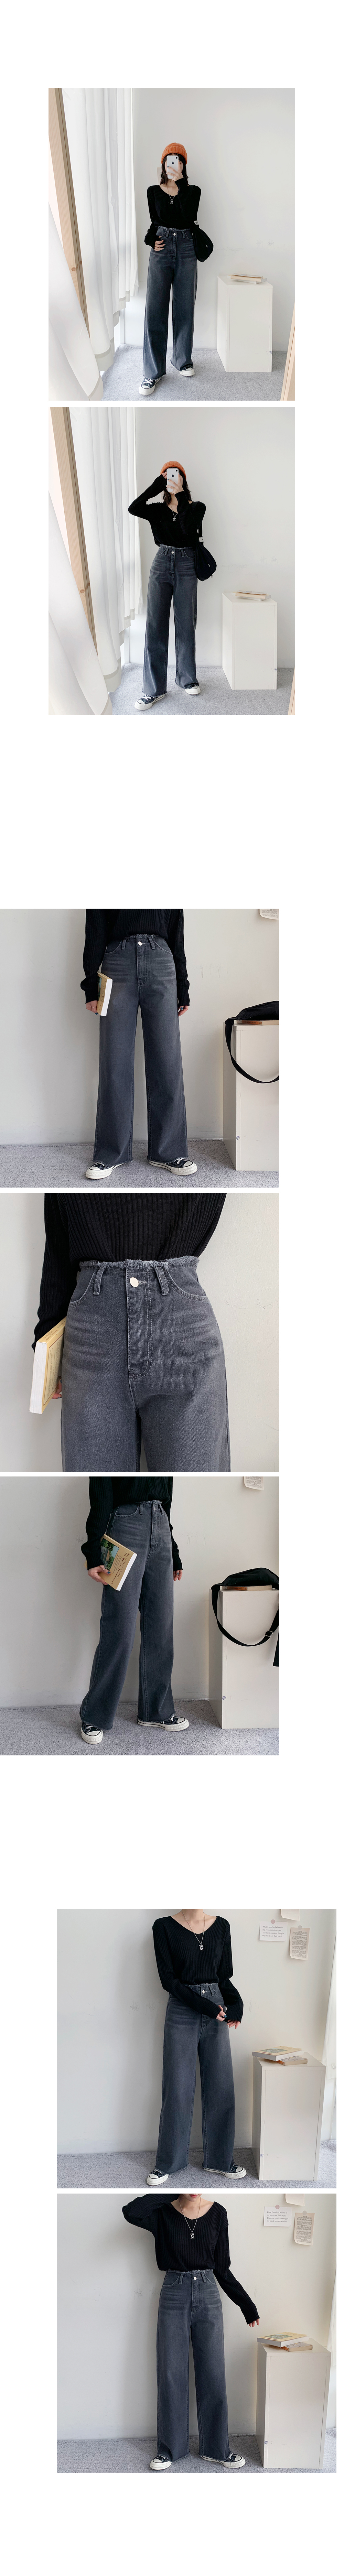 Lovely High Surgical Denim Pants